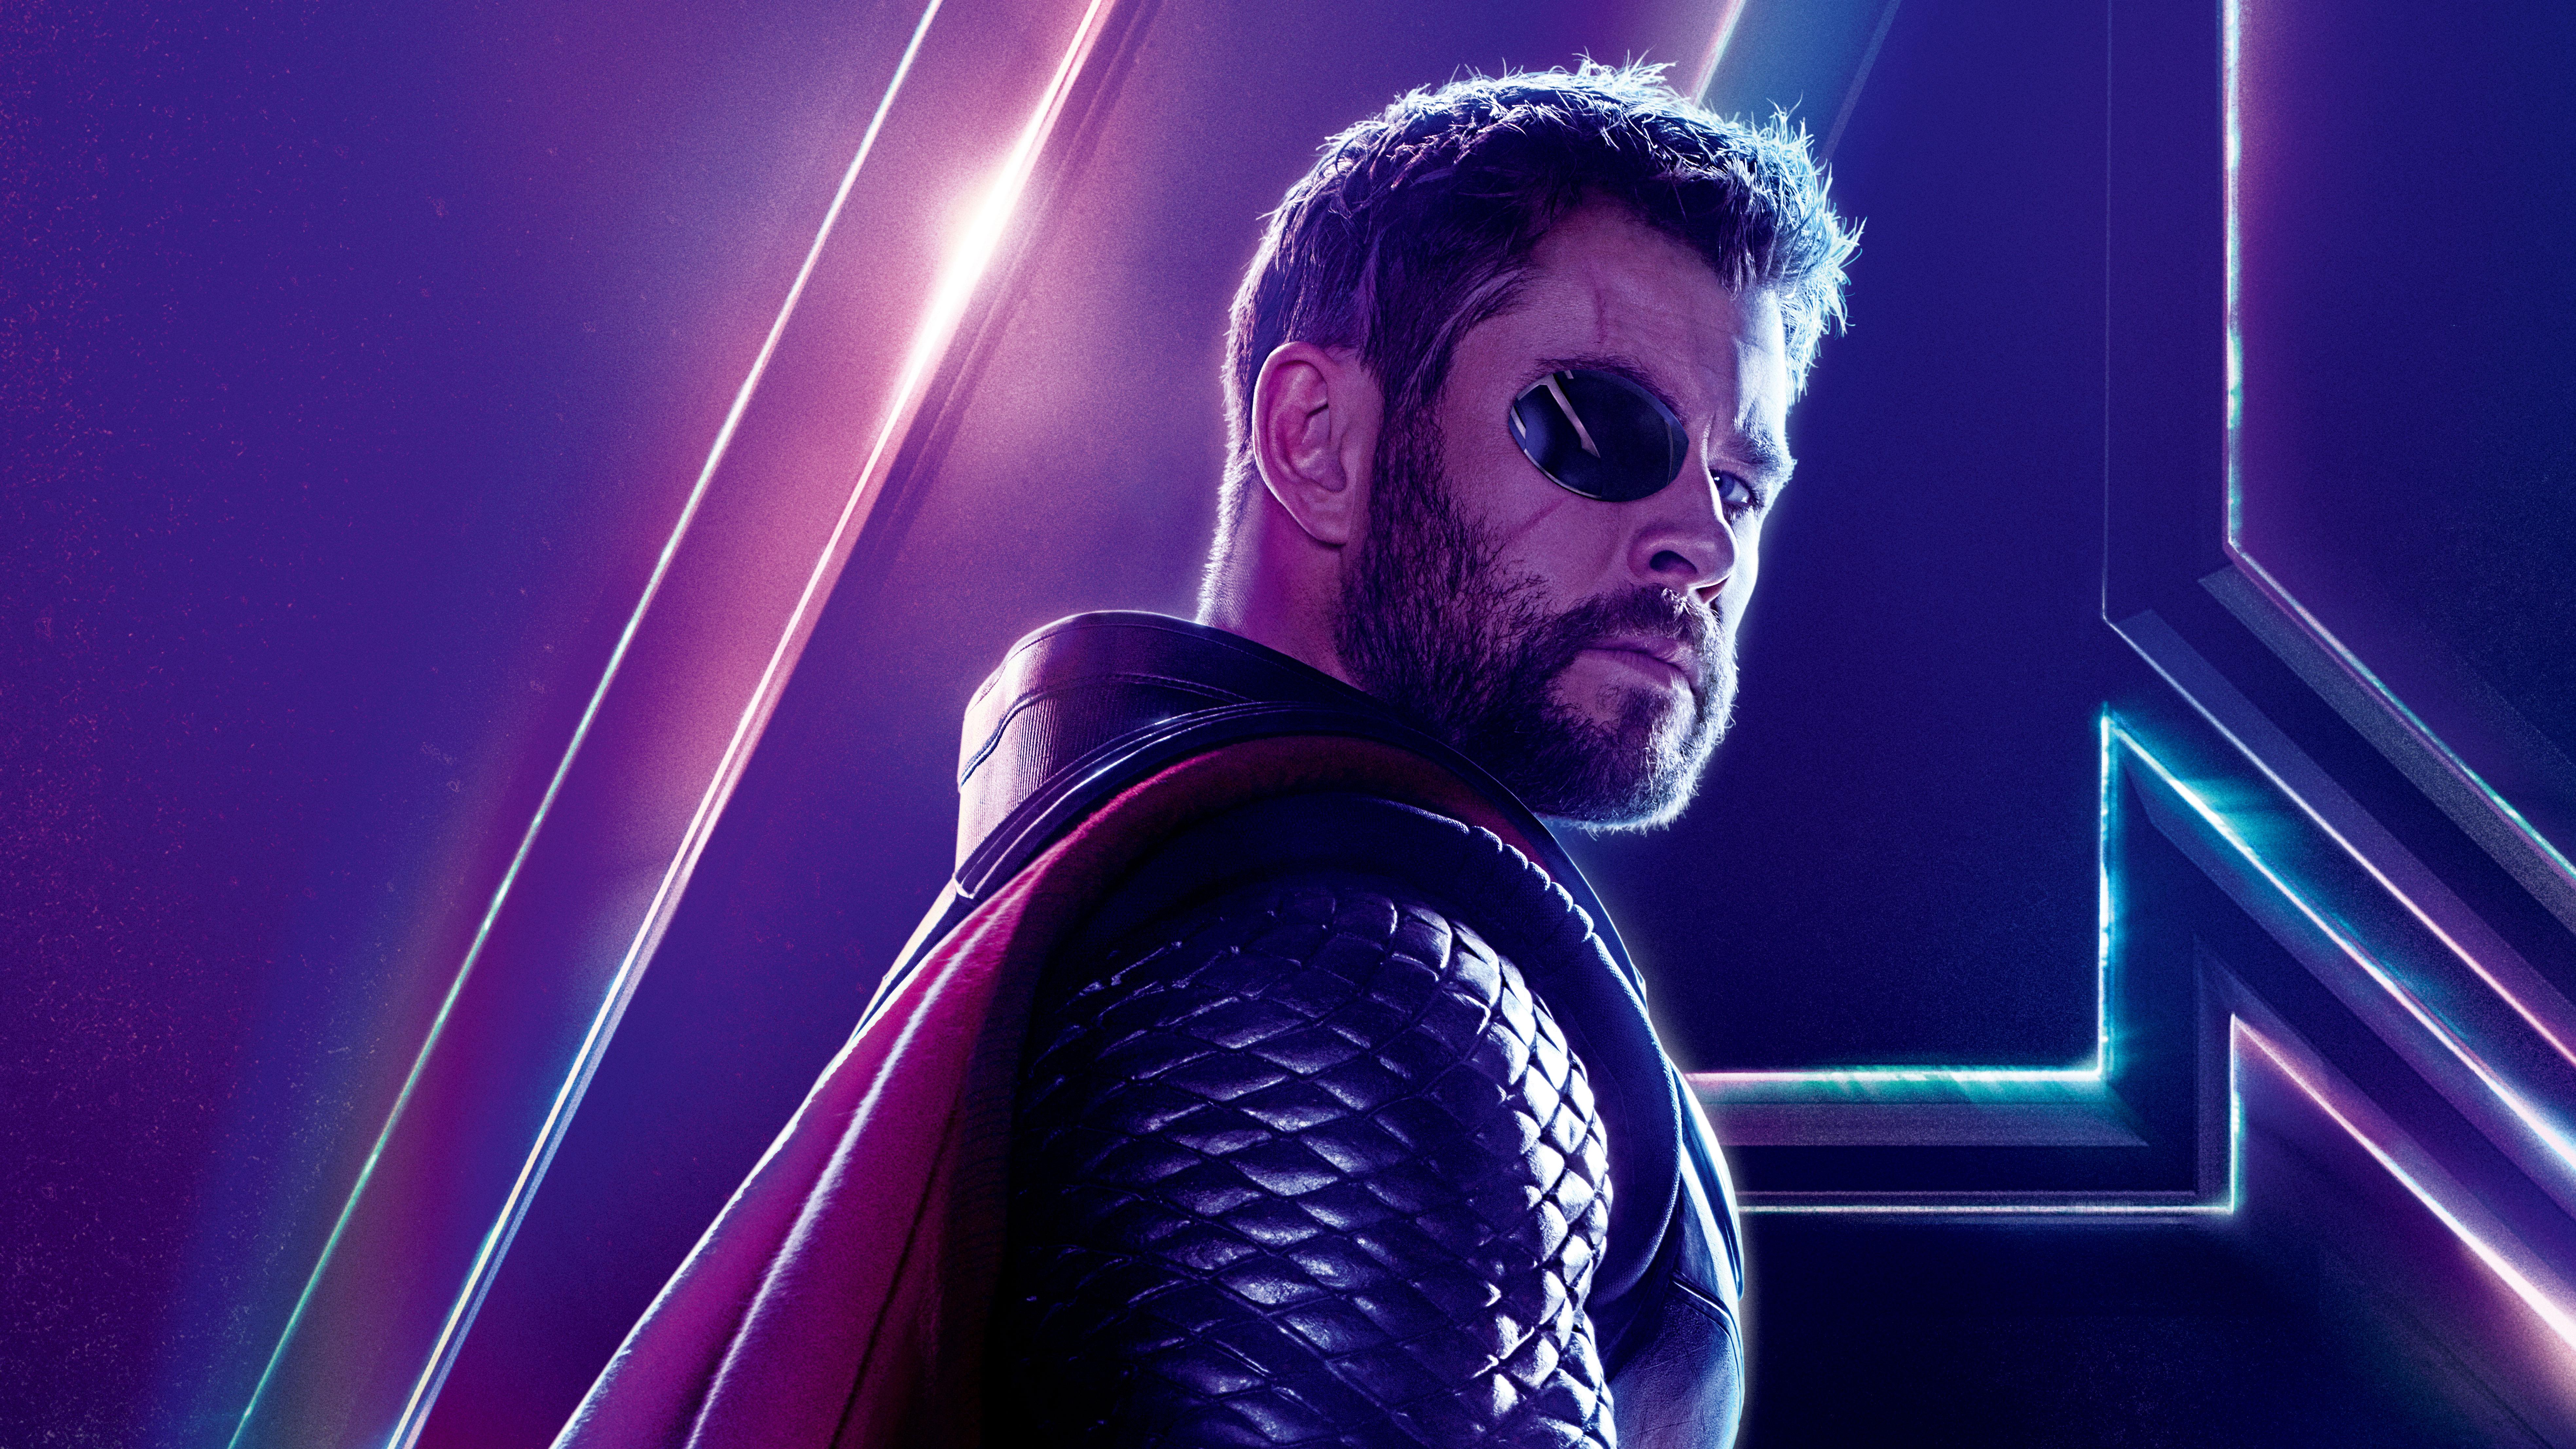 Shuri In Avengers Infinity War New Poster Hd Movies 4k: Thor In Avengers Infinity War New 8k Poster, HD Movies, 4k